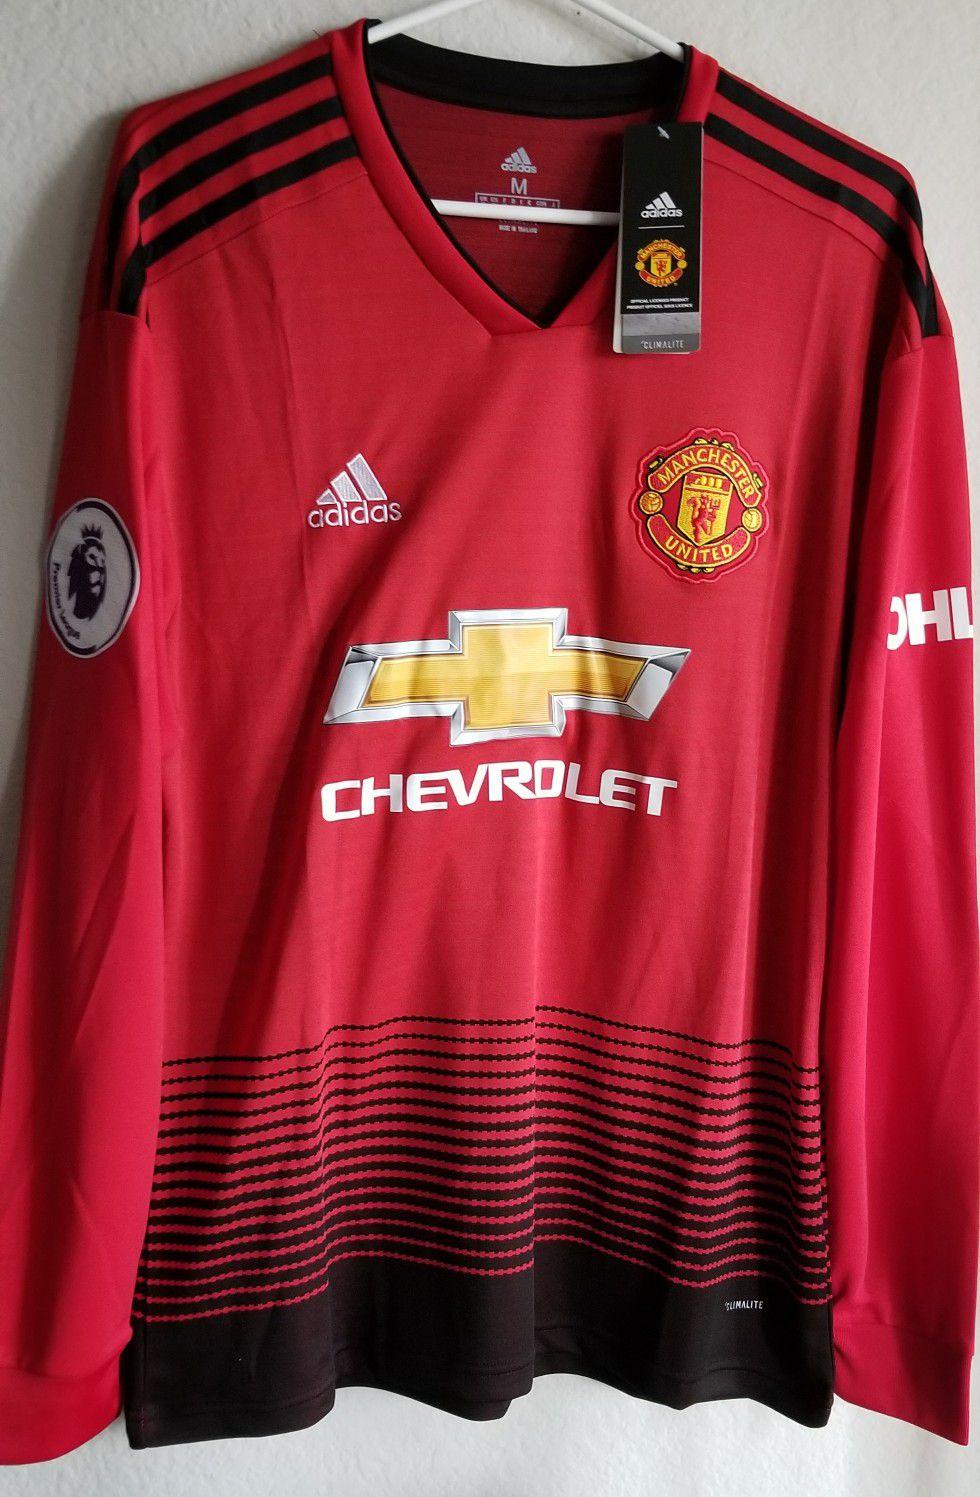 Adidas Mens 2018/19 Man united Home jersey Long sleeves ORIGINAL